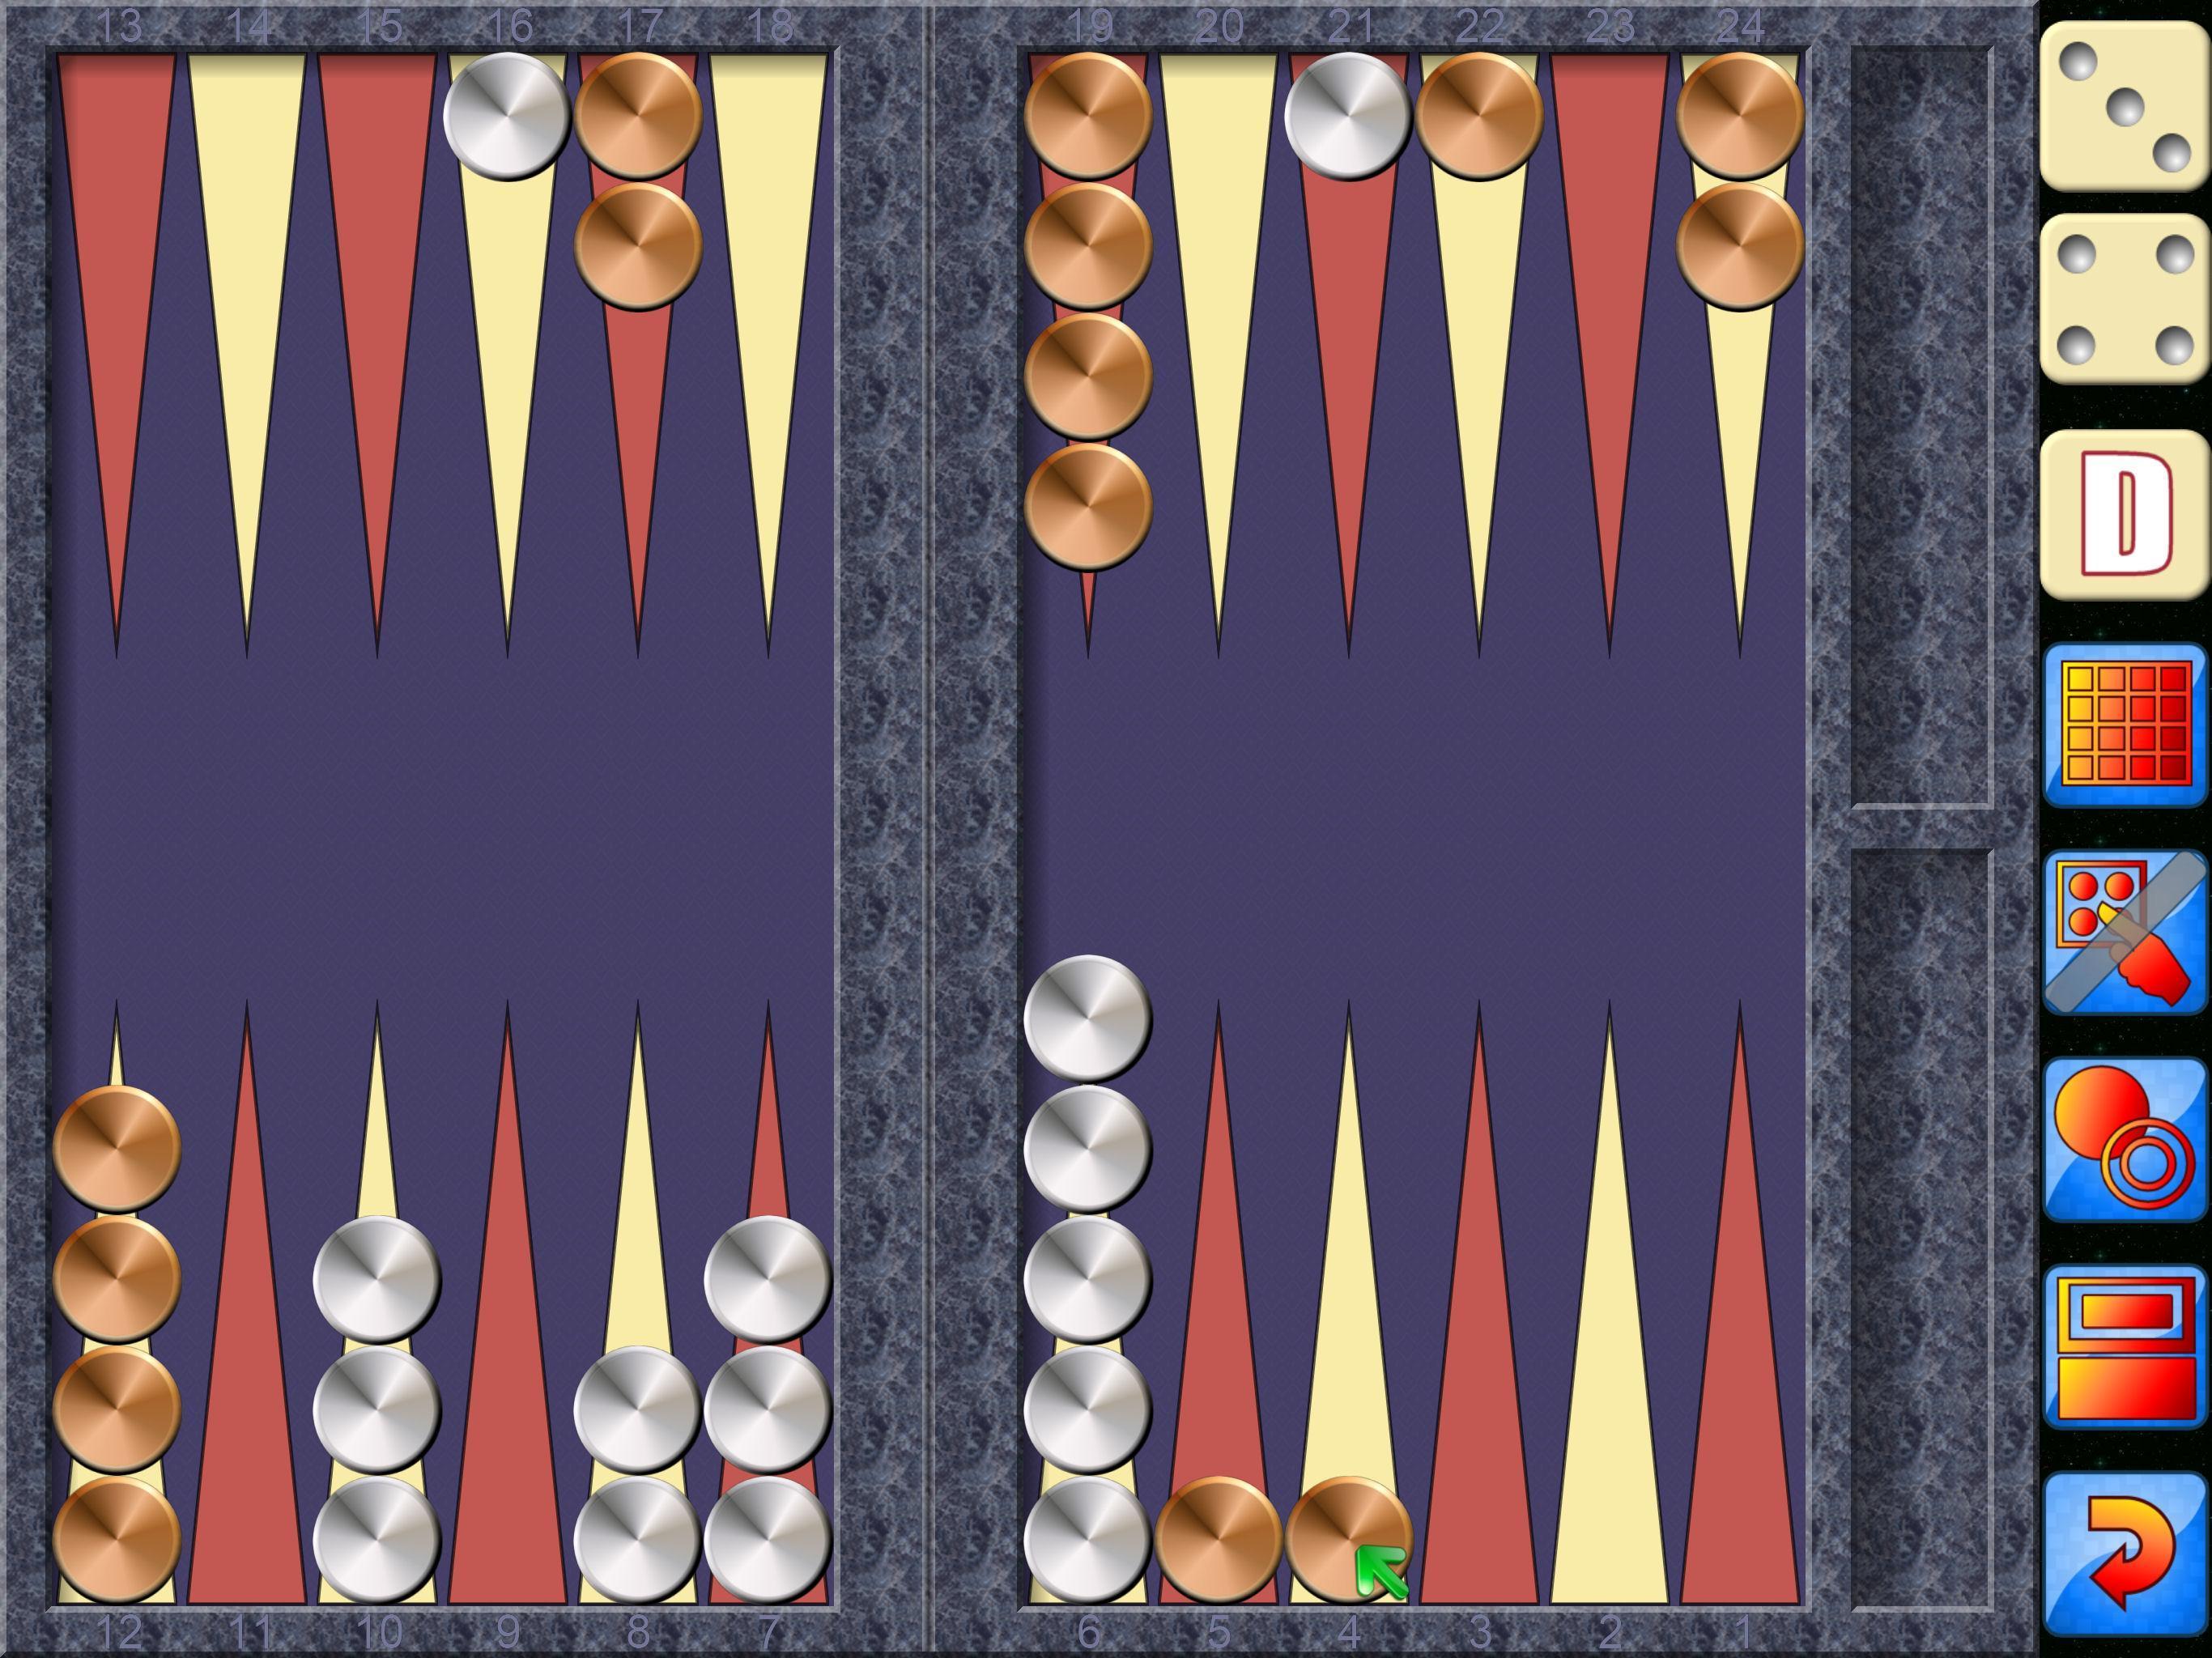 Backgammon V+, online multiplayer backgammon 5.25.64 Screenshot 7